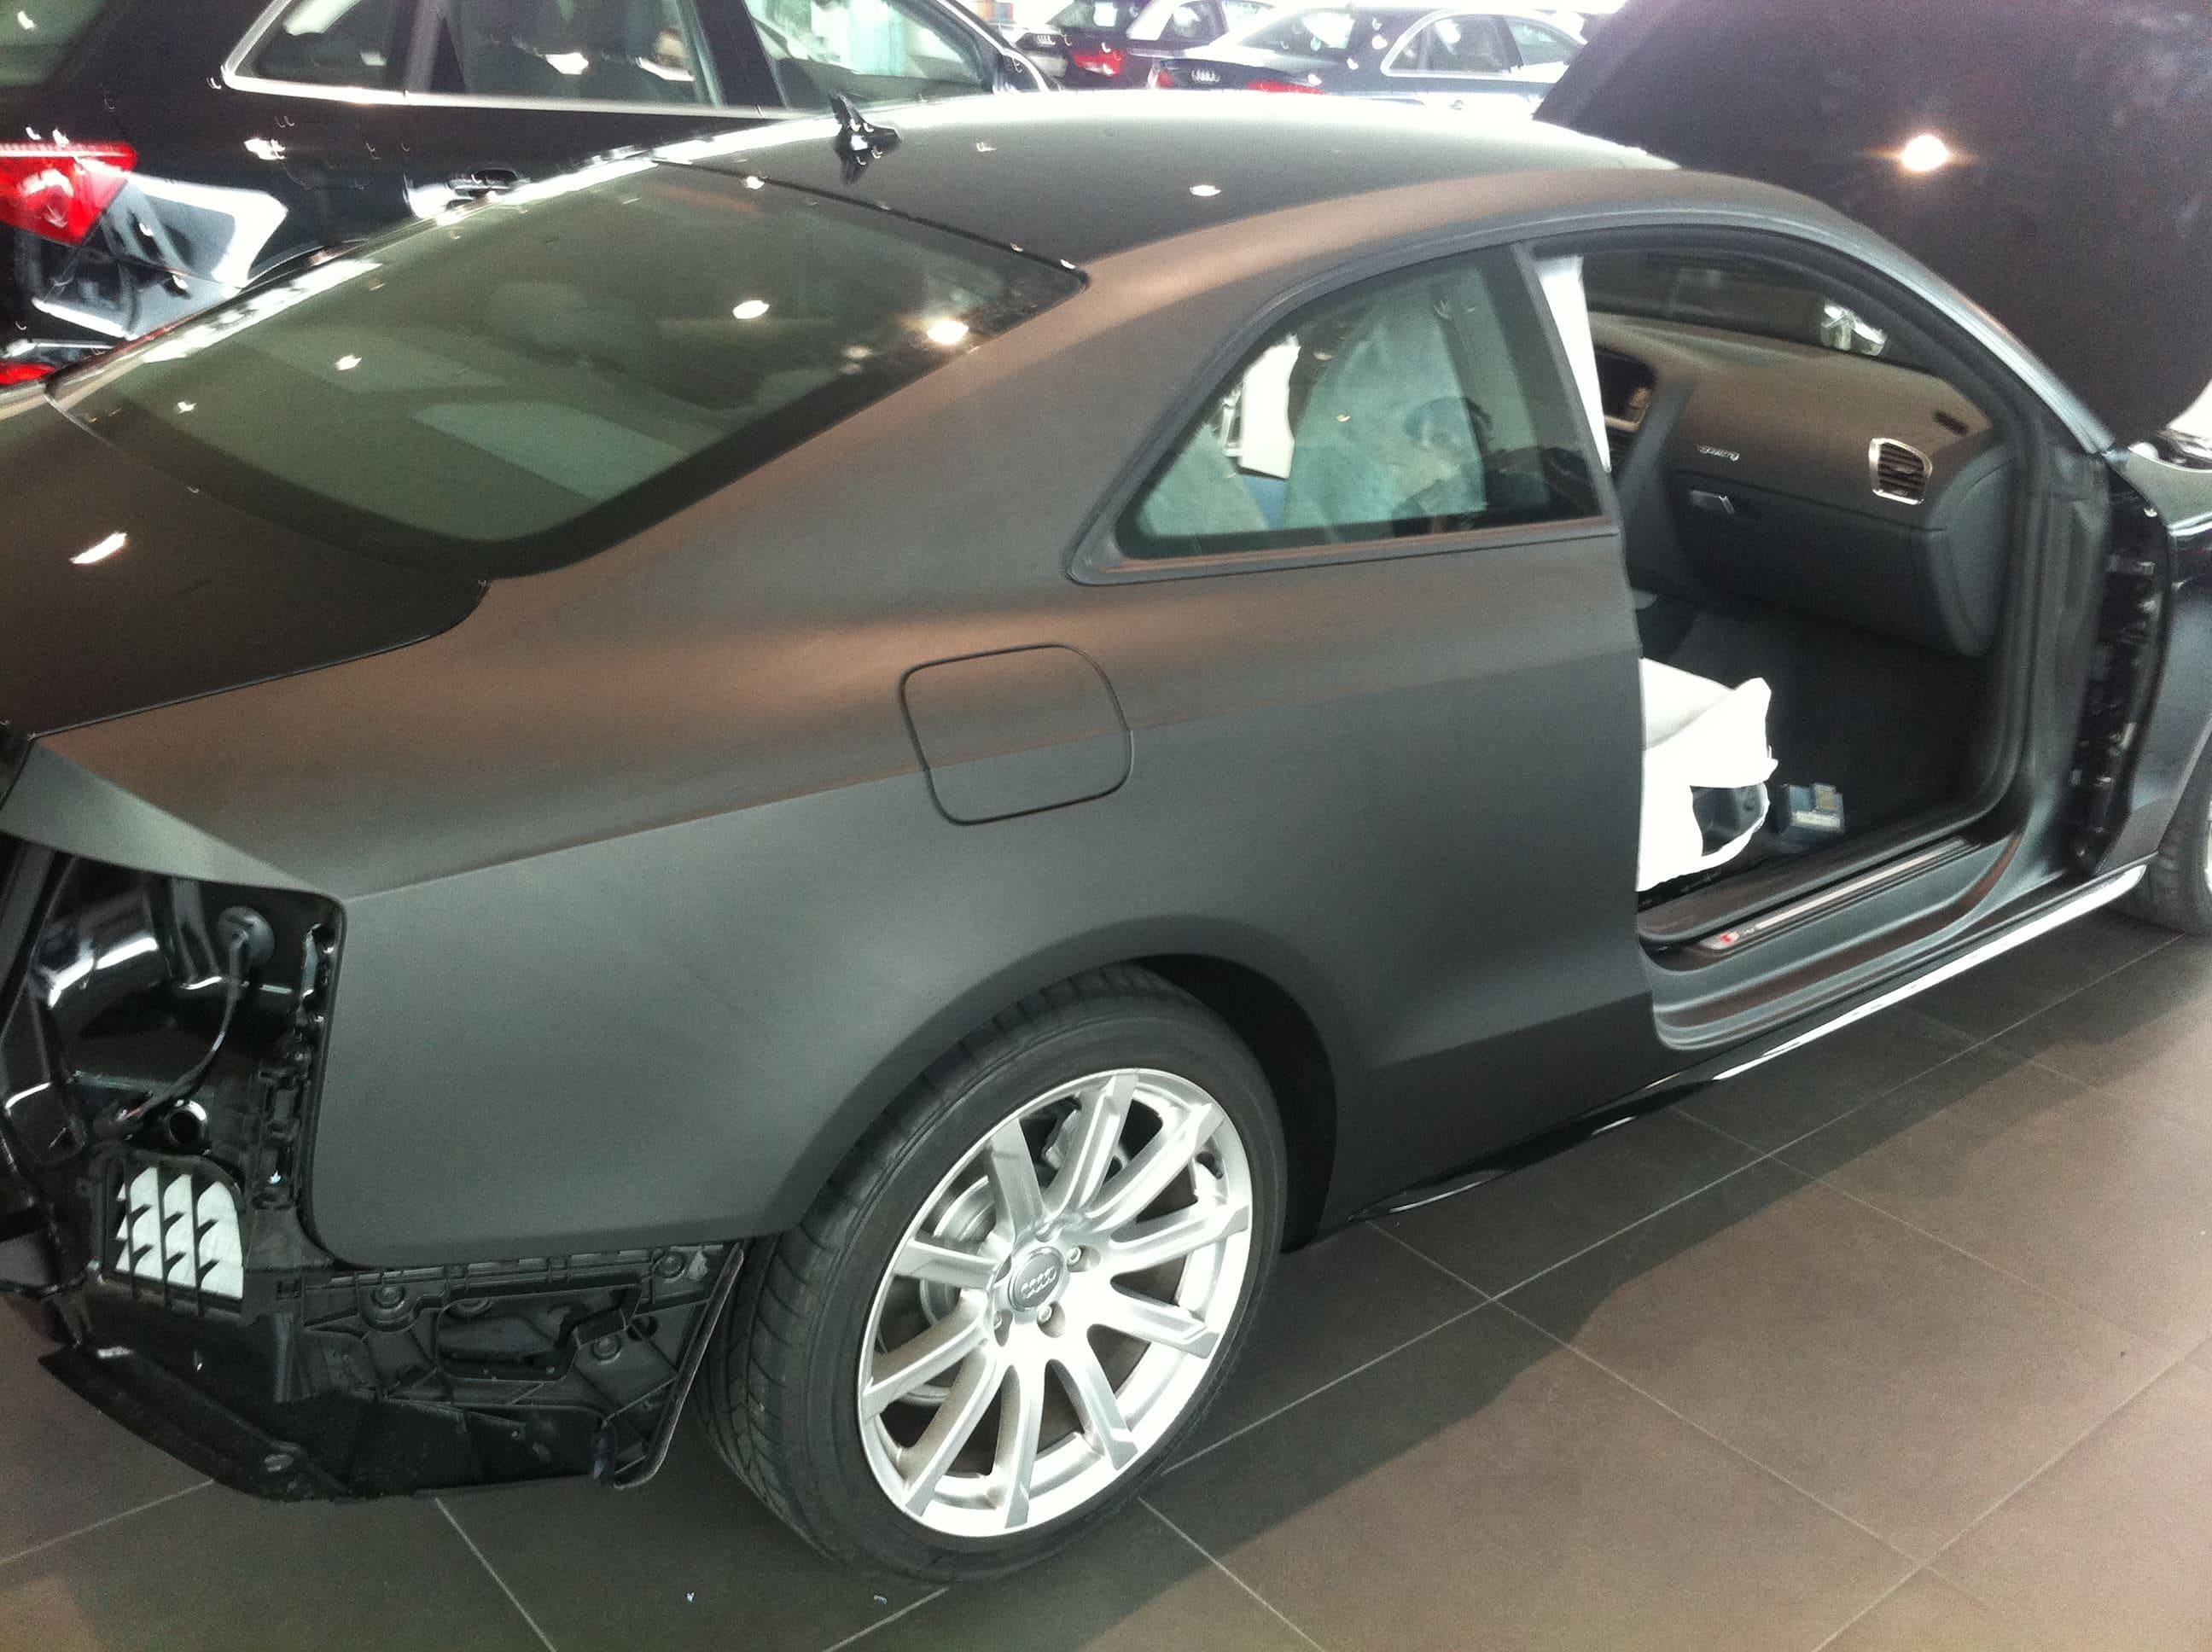 Audi A5 Coupe met Mat Zwarte Wrap, Carwrapping door Wrapmyride.nu Foto-nr:4571, ©2021